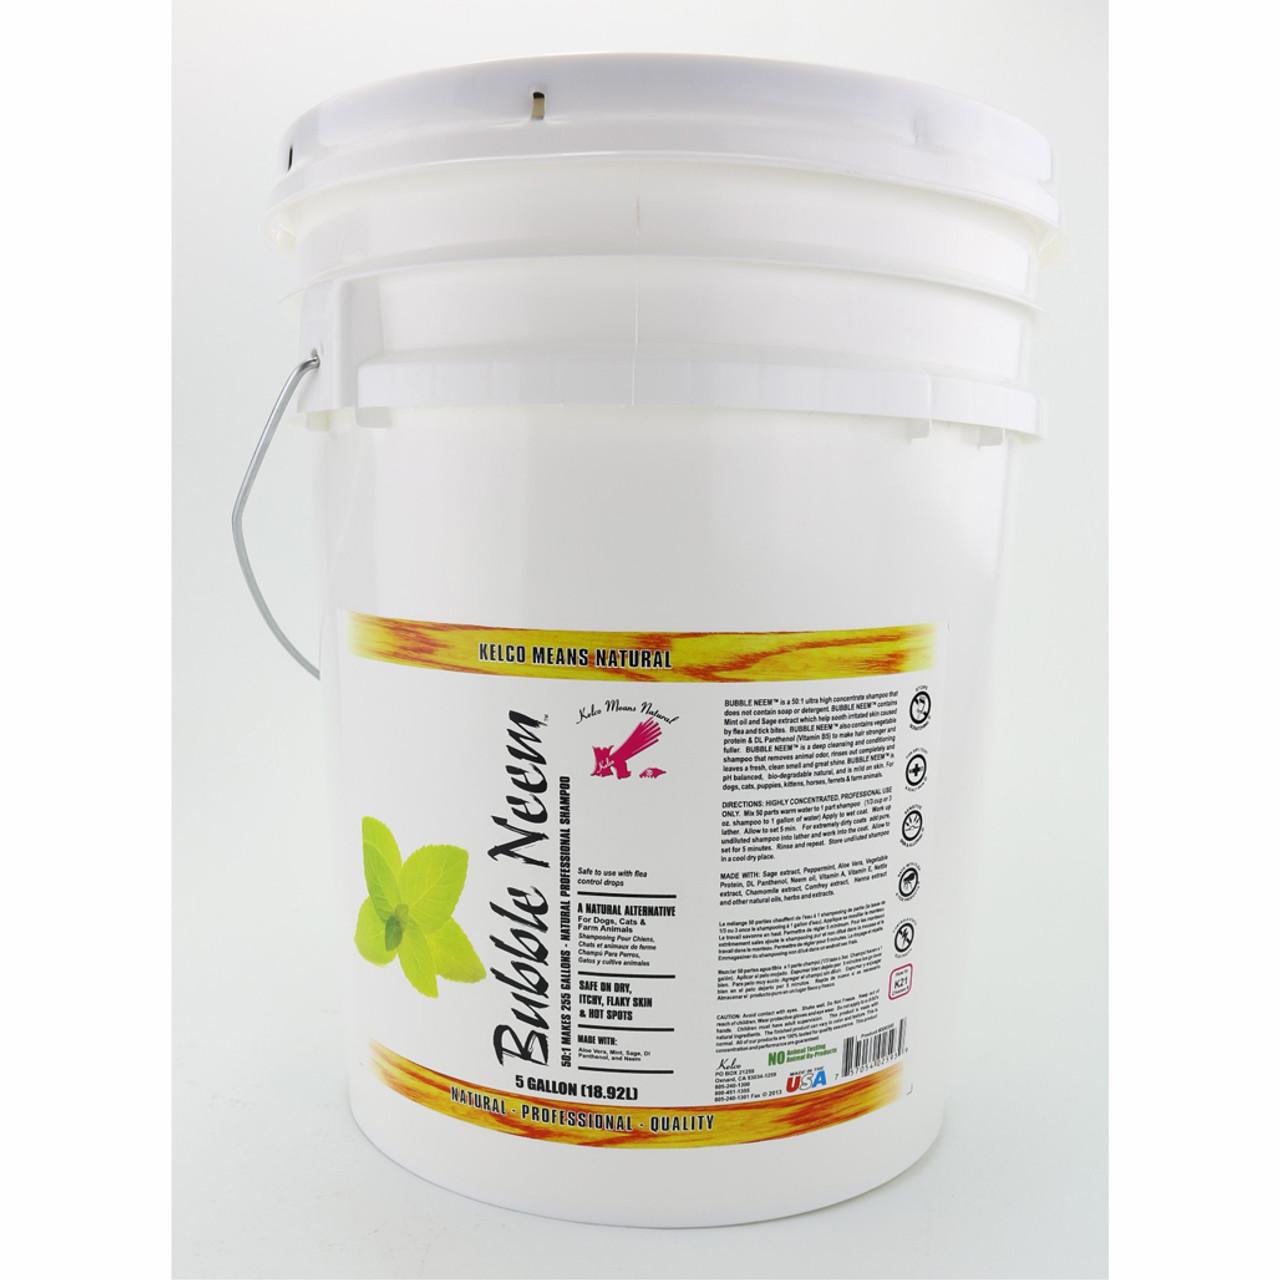 Kelco Bubble Neem Shampoo in 5 Gallon Size